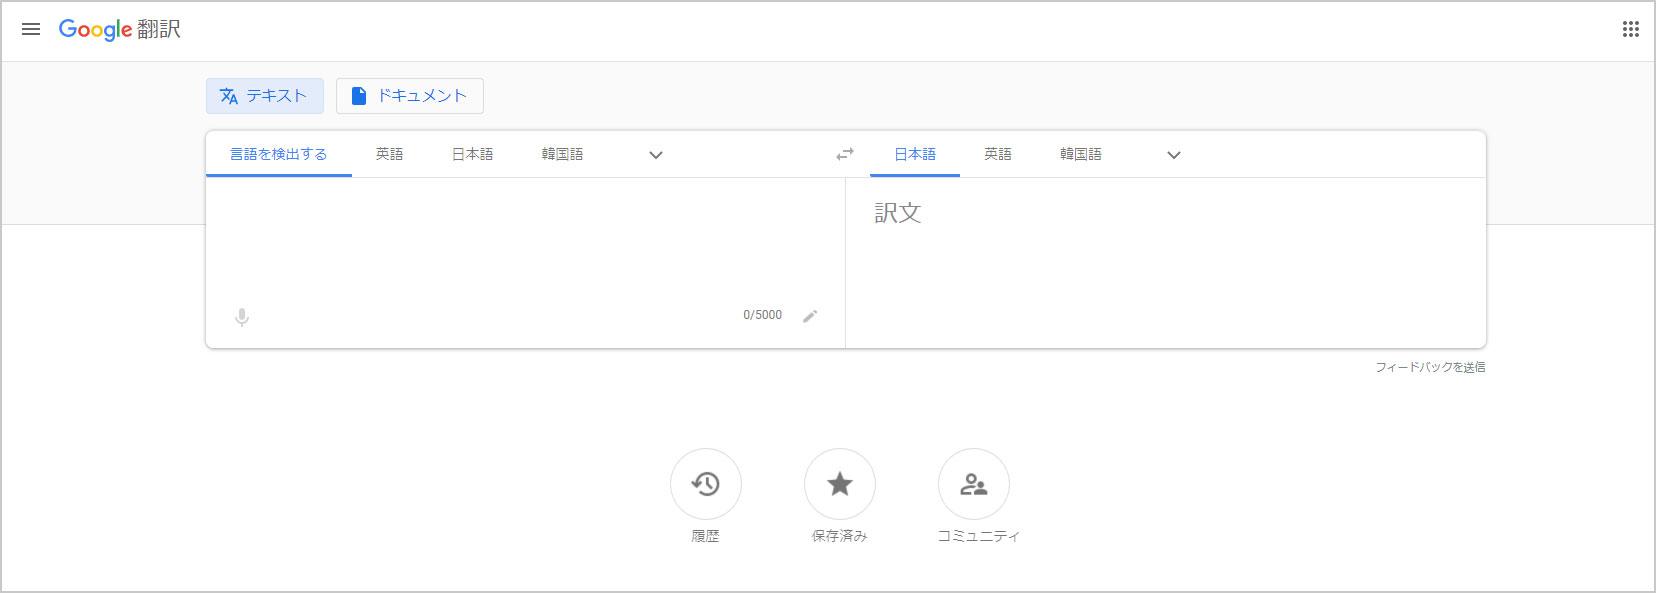 Google翻訳TOPページ